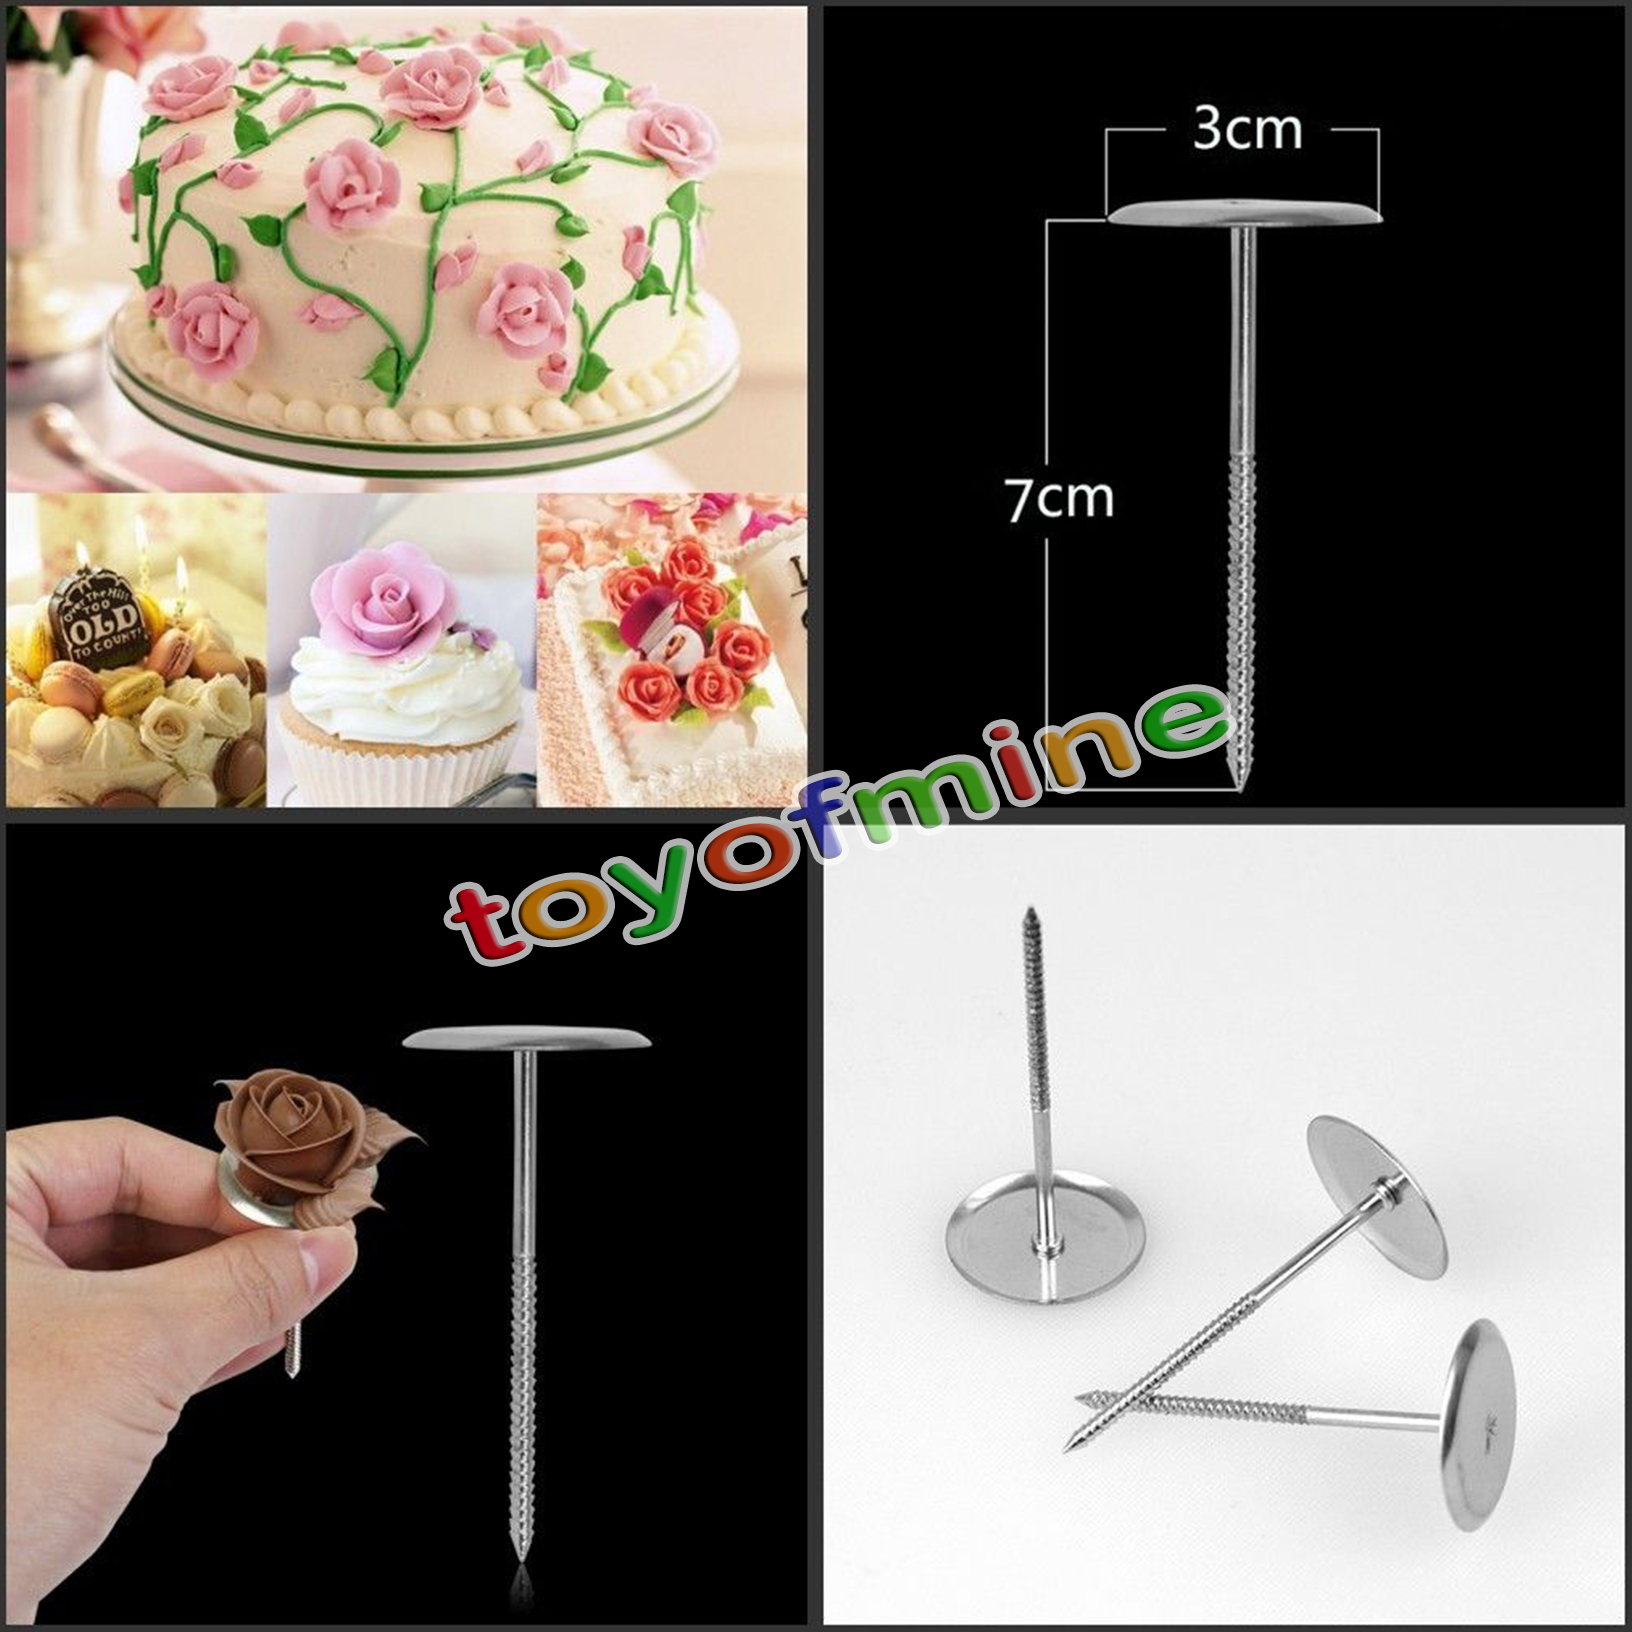 Flower Nail Cake: 5pc Piping Flower Nail Icing Cream Bake Cake Decorating